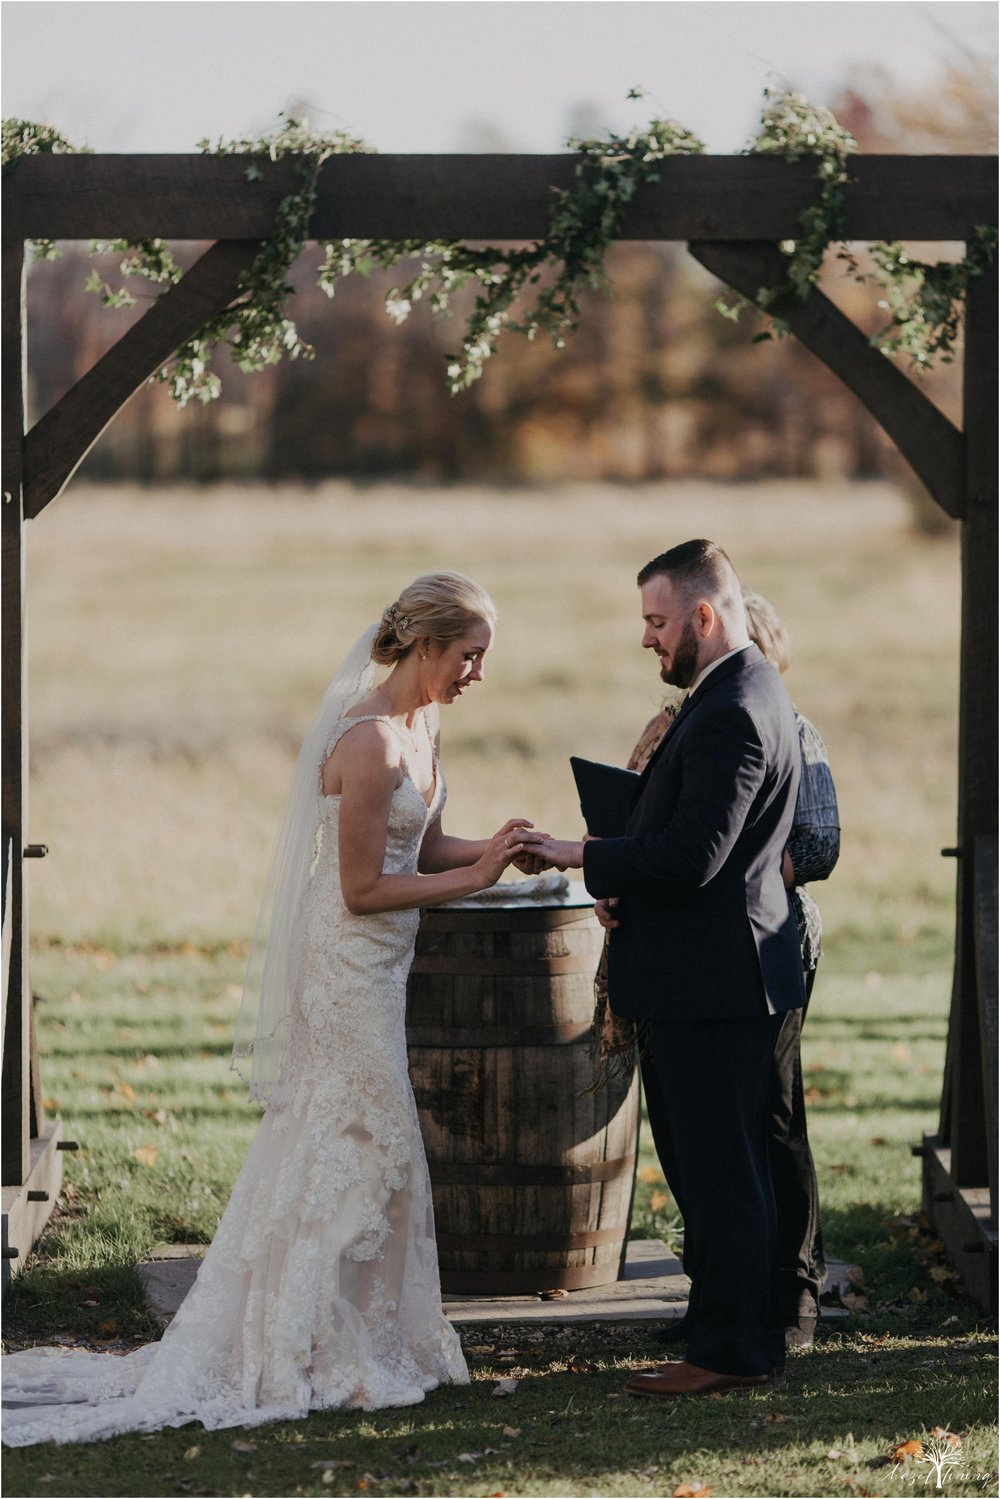 briana-krans-greg-johnston-farm-bakery-and-events-fall-wedding_0101.jpg